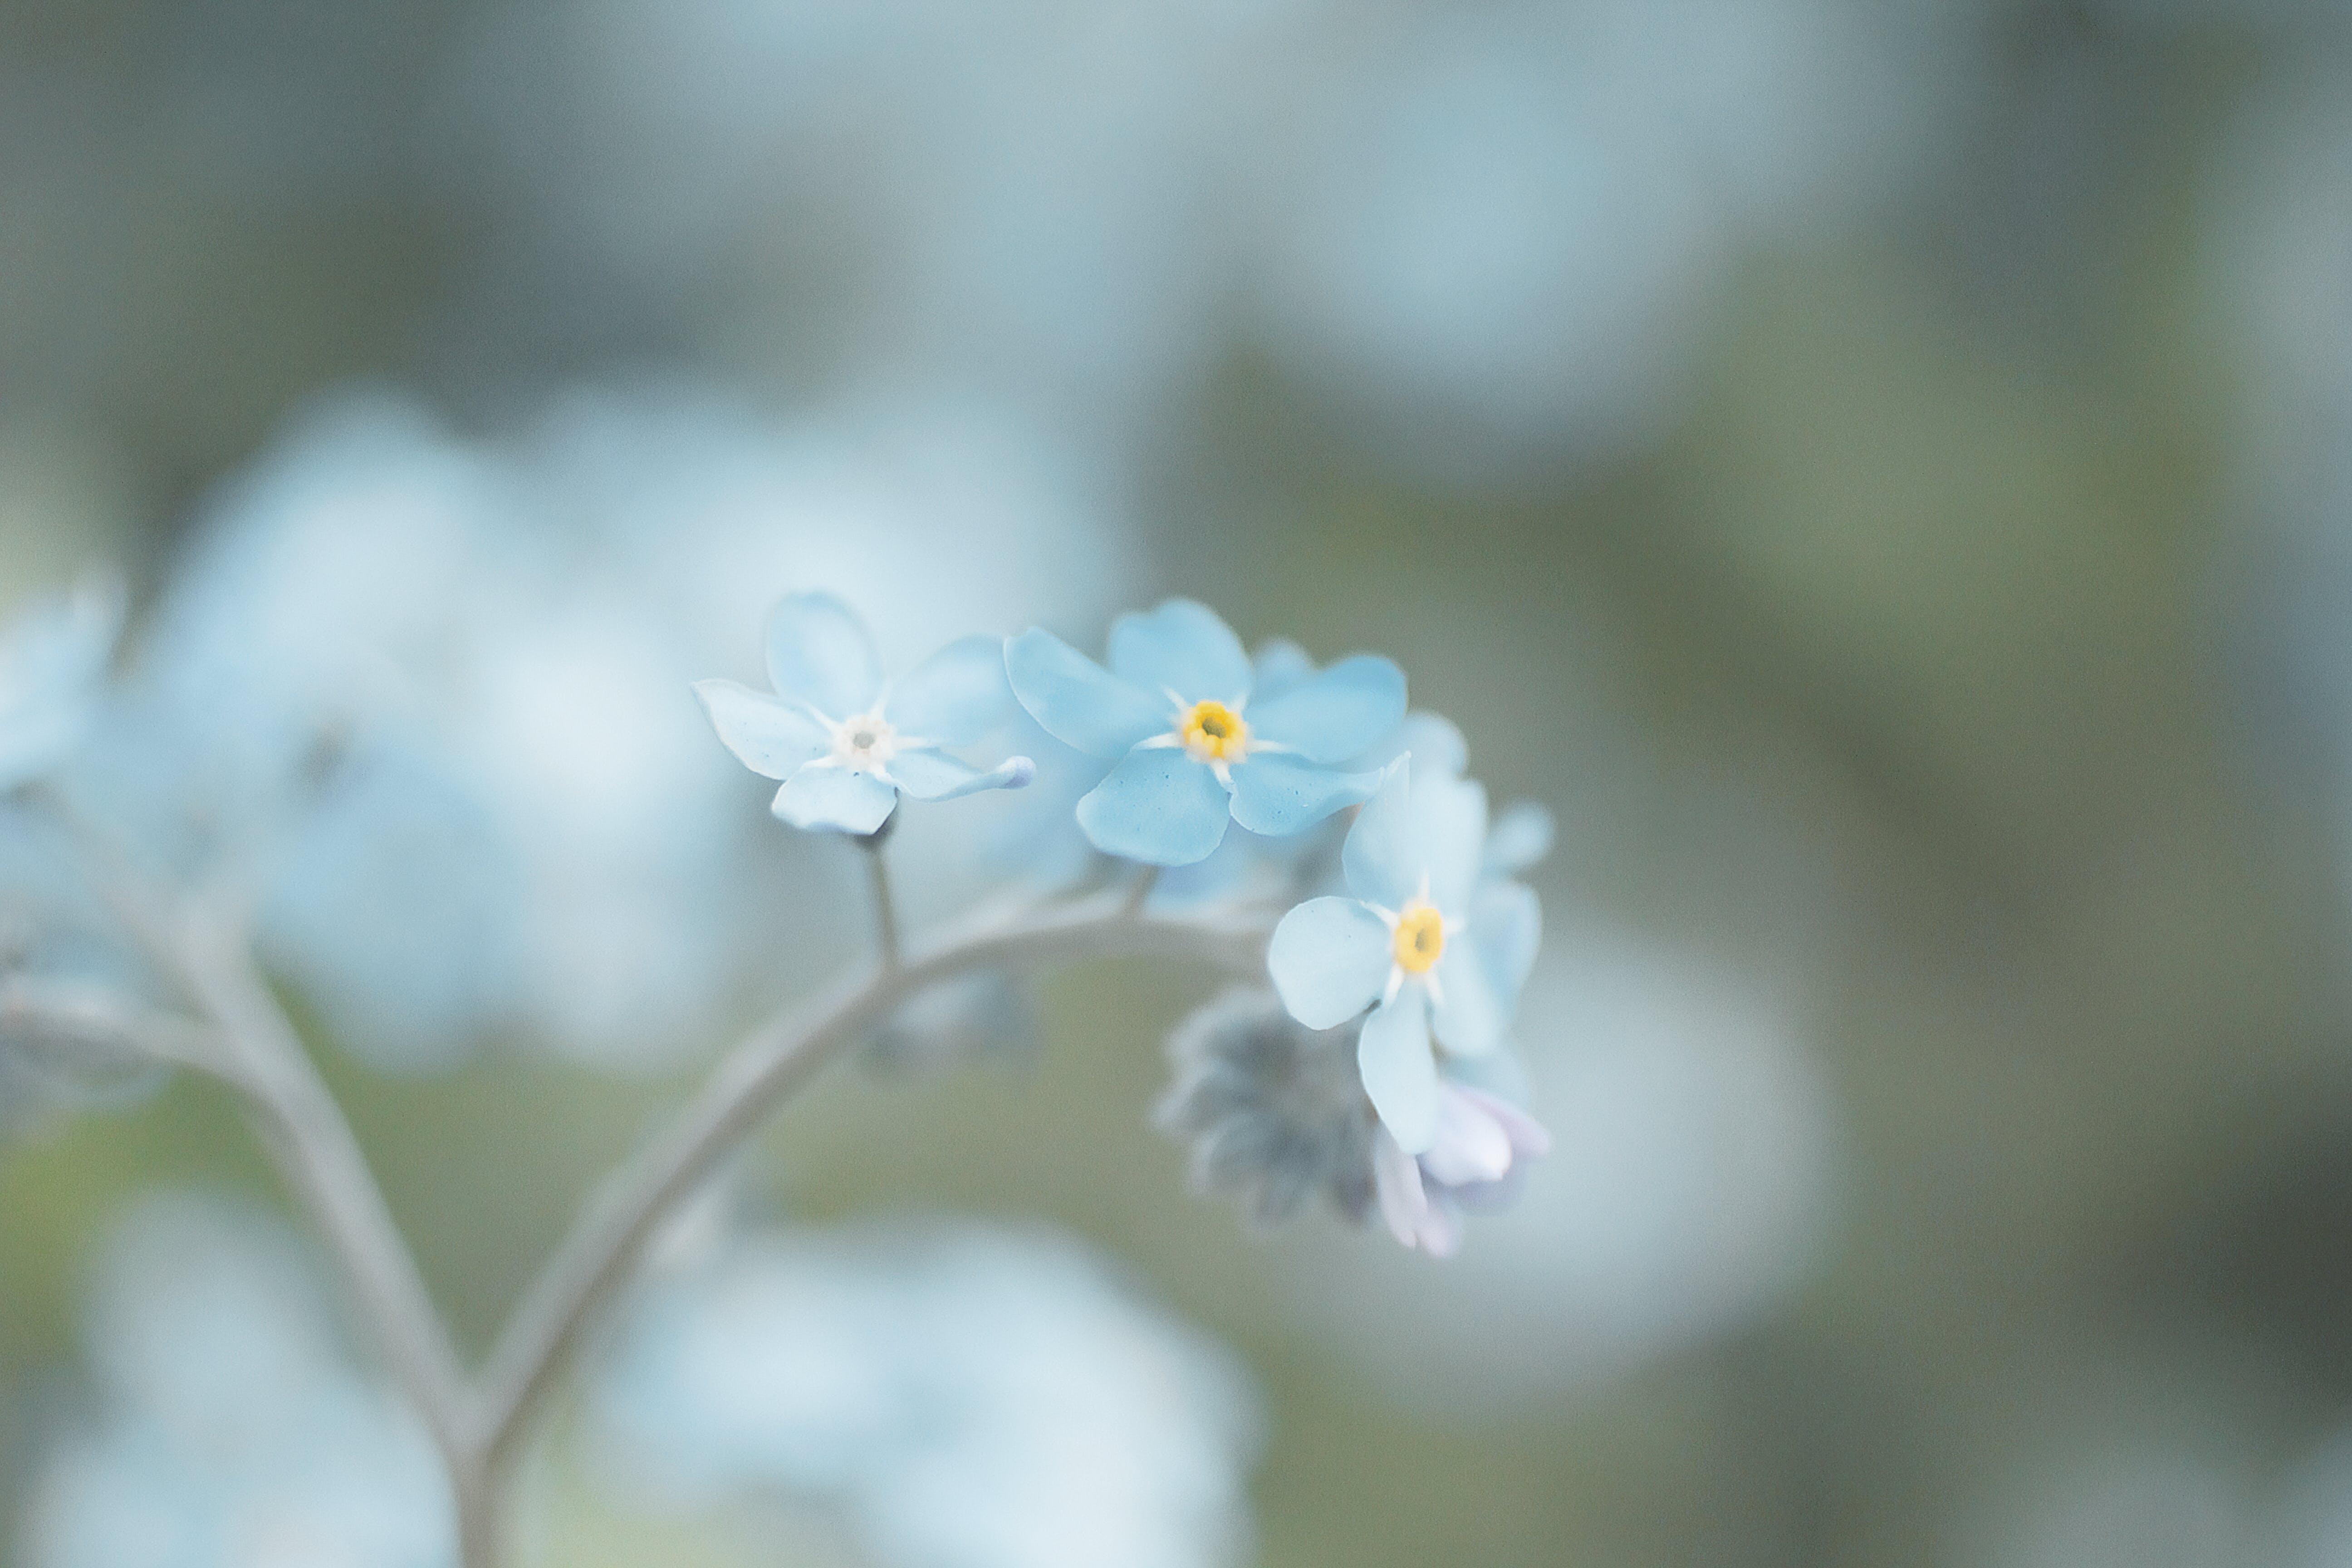 Bahçe, bitki örtüsü, çiçek